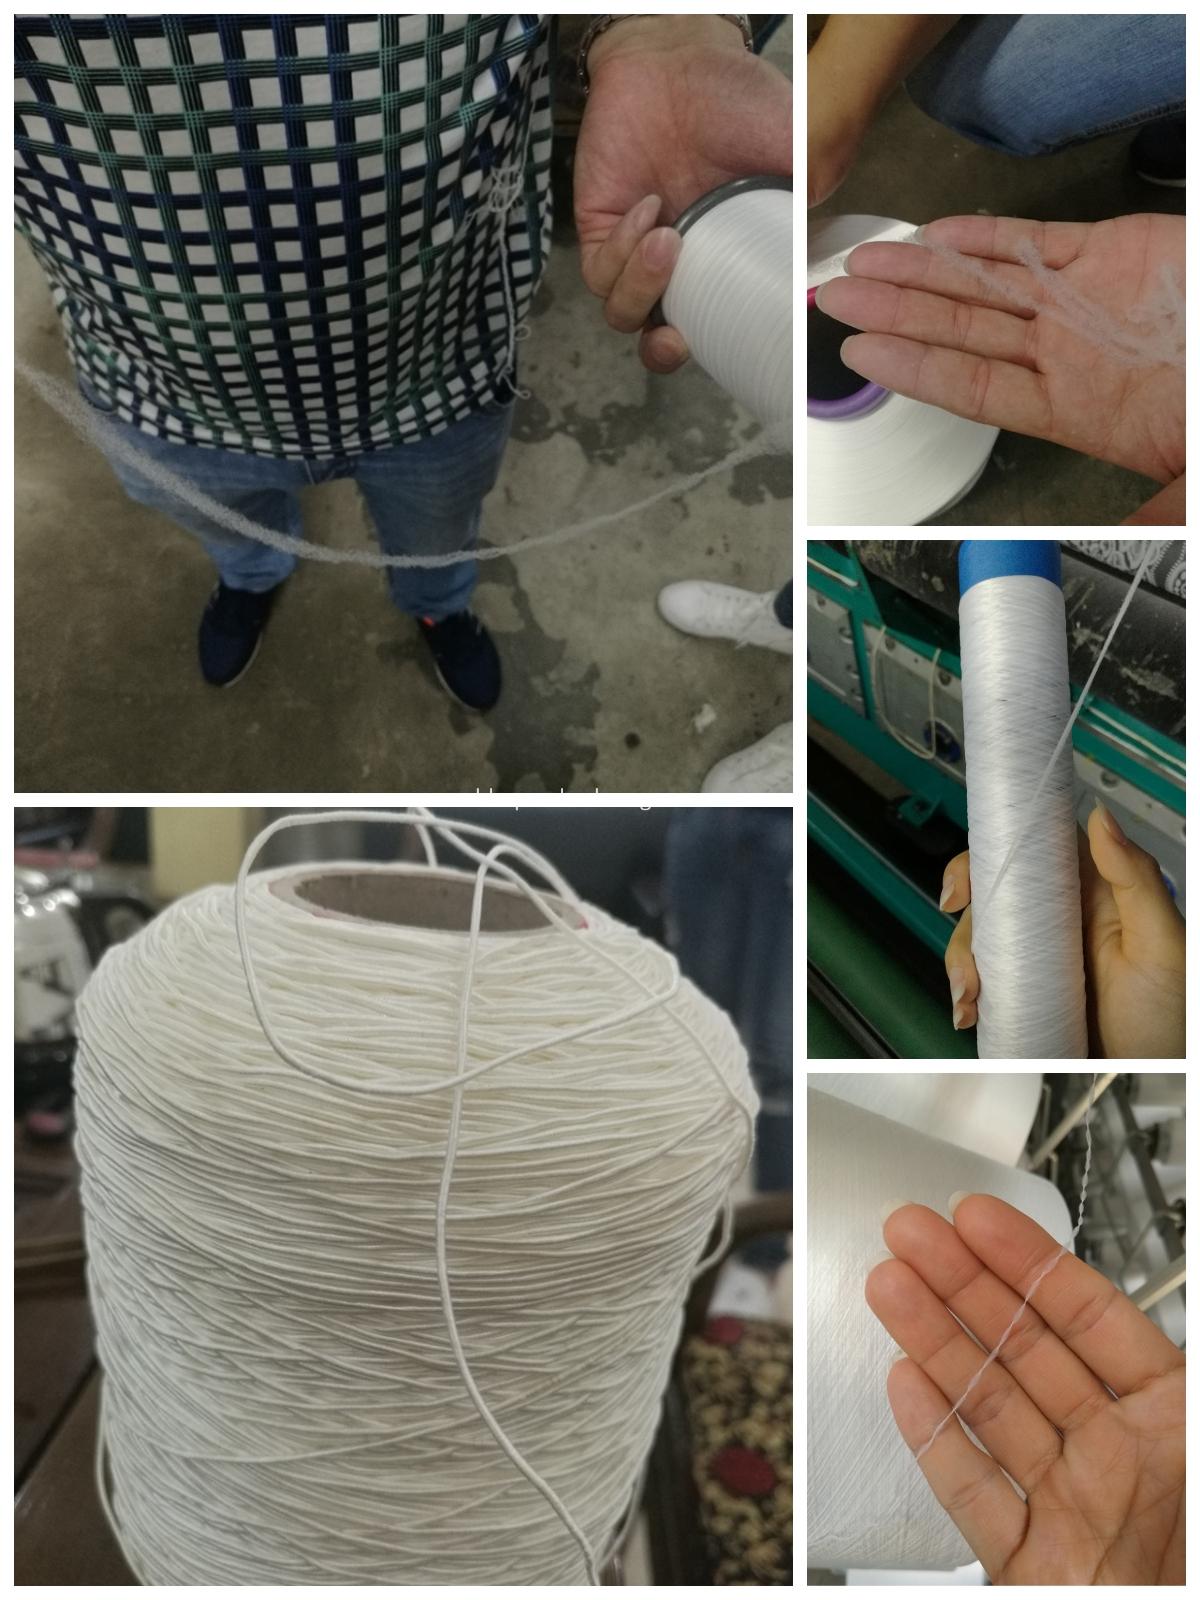 covering yarn